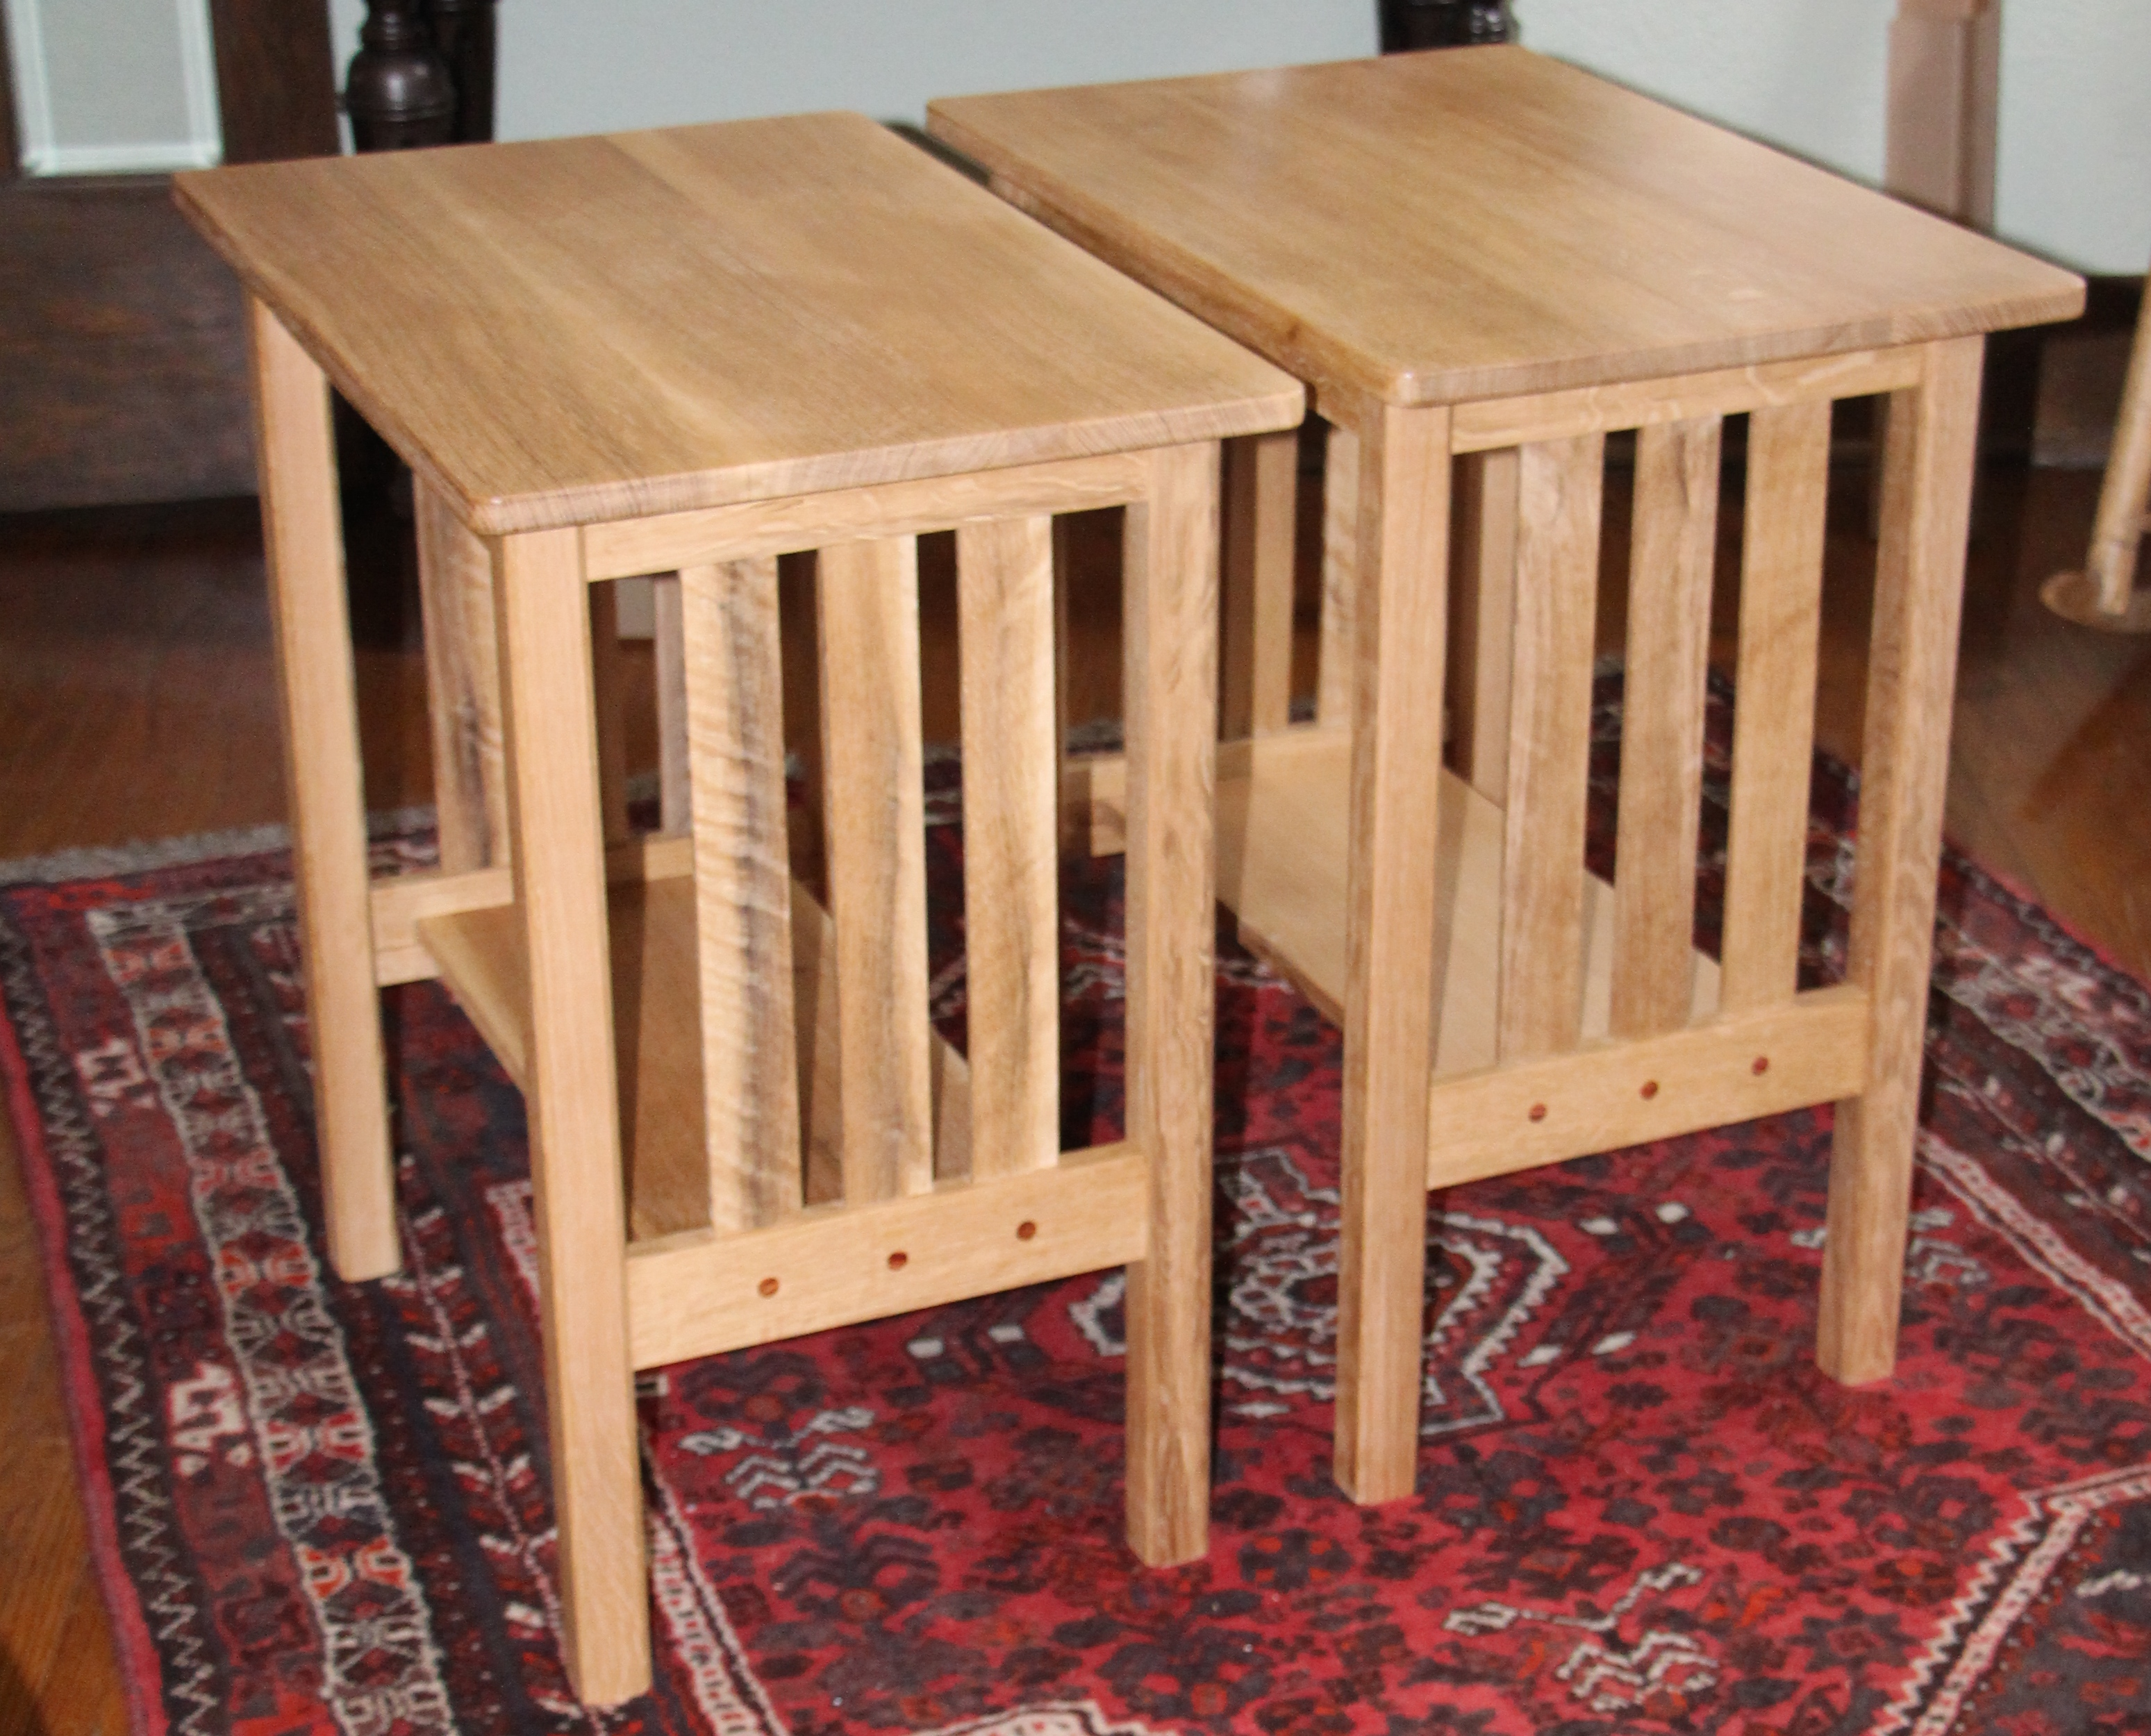 Fine Furniture Brian McIntosh Woodworking London ON